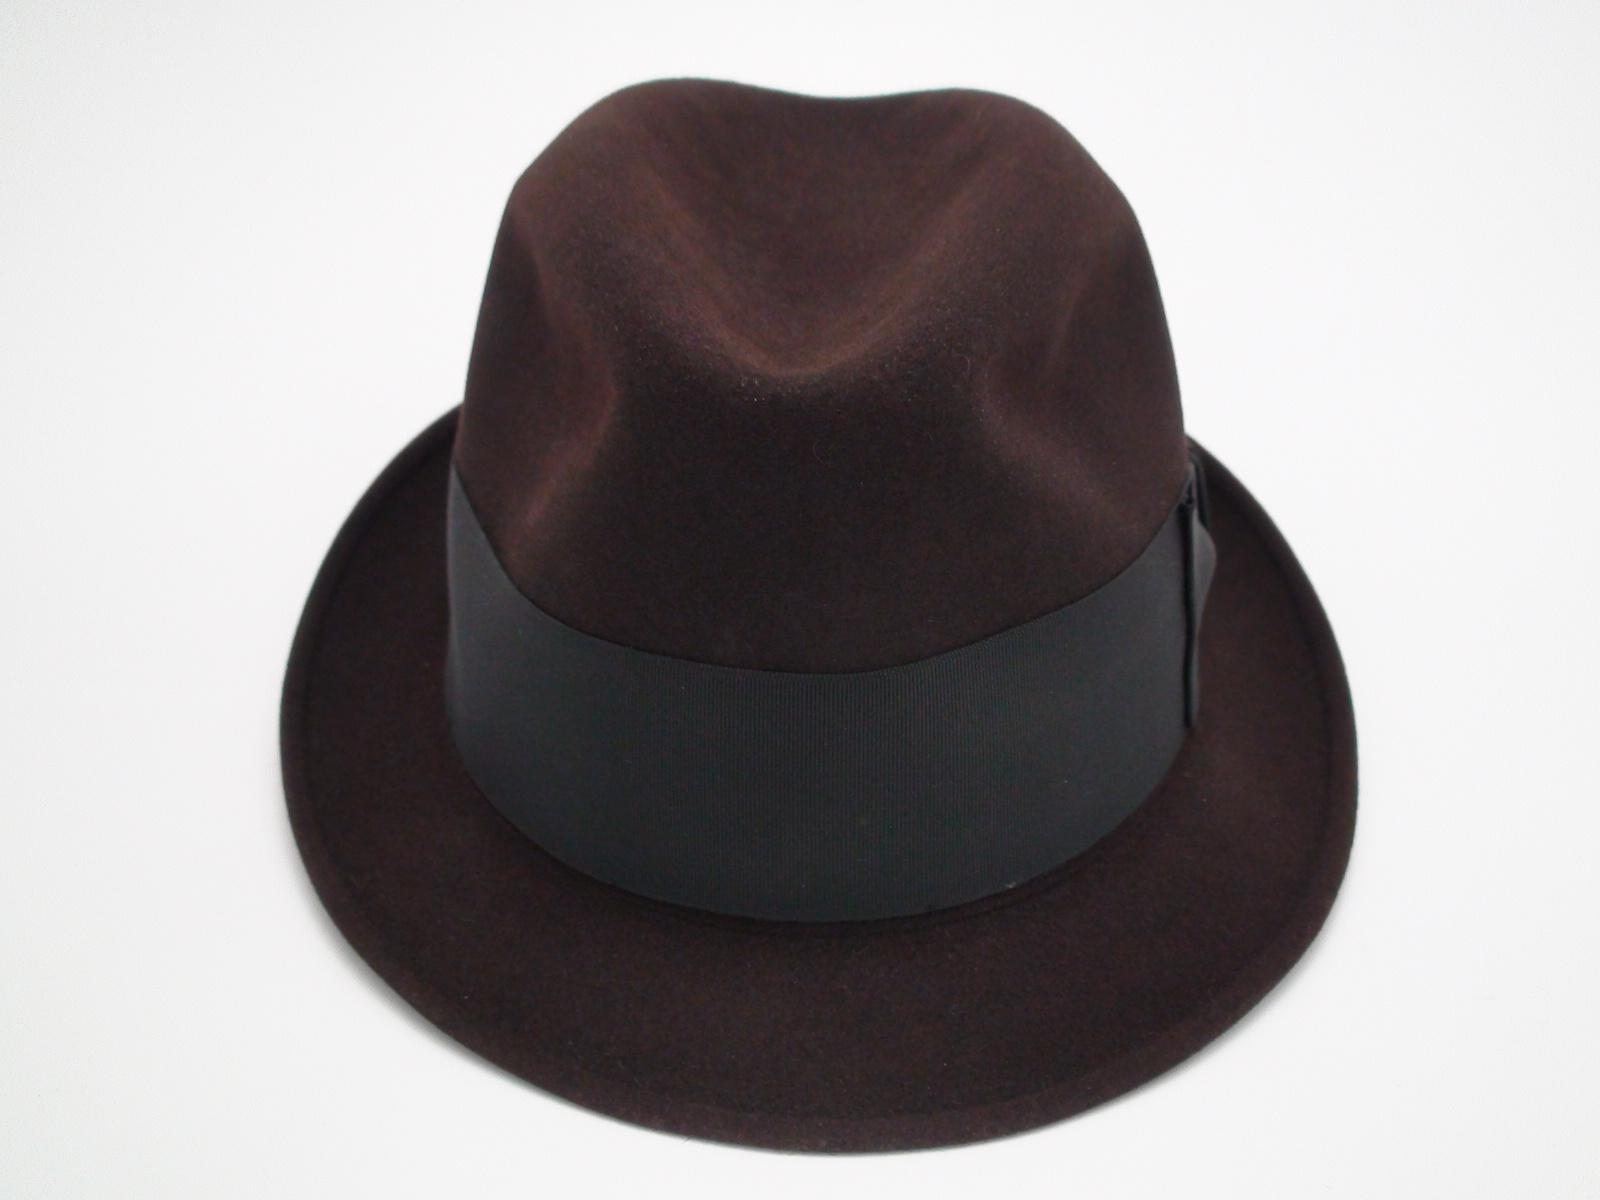 c6e458cf201c4 ... best price knox twenty new york custom edge brown fur felt fedora hat  3c9d4 41215